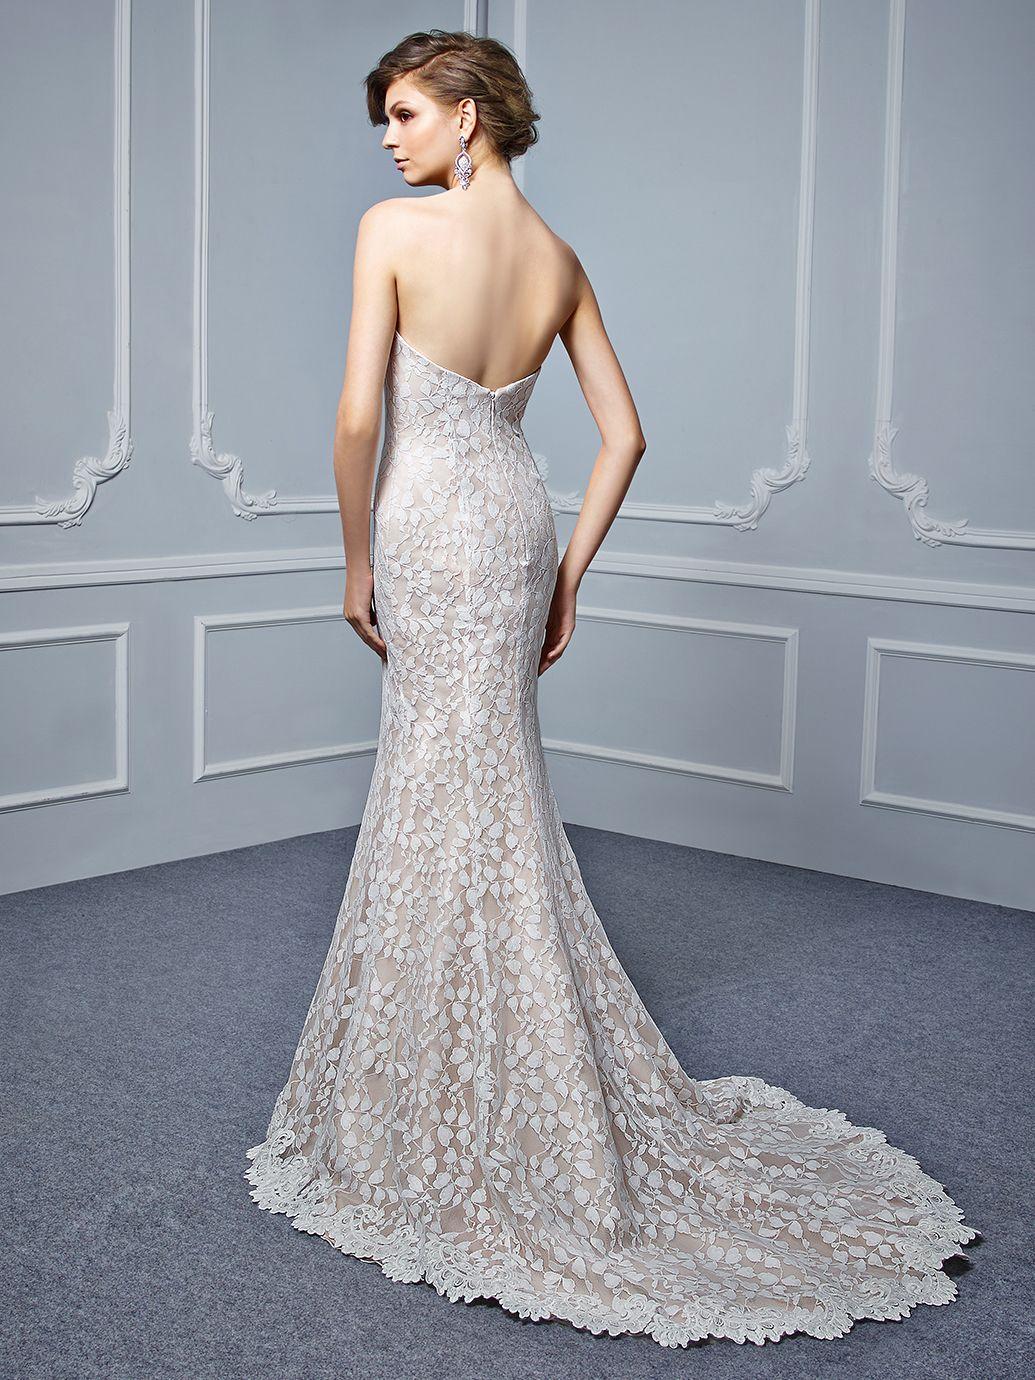 enzoani wedding dress 2017 beautiful collection, bt17-25, back